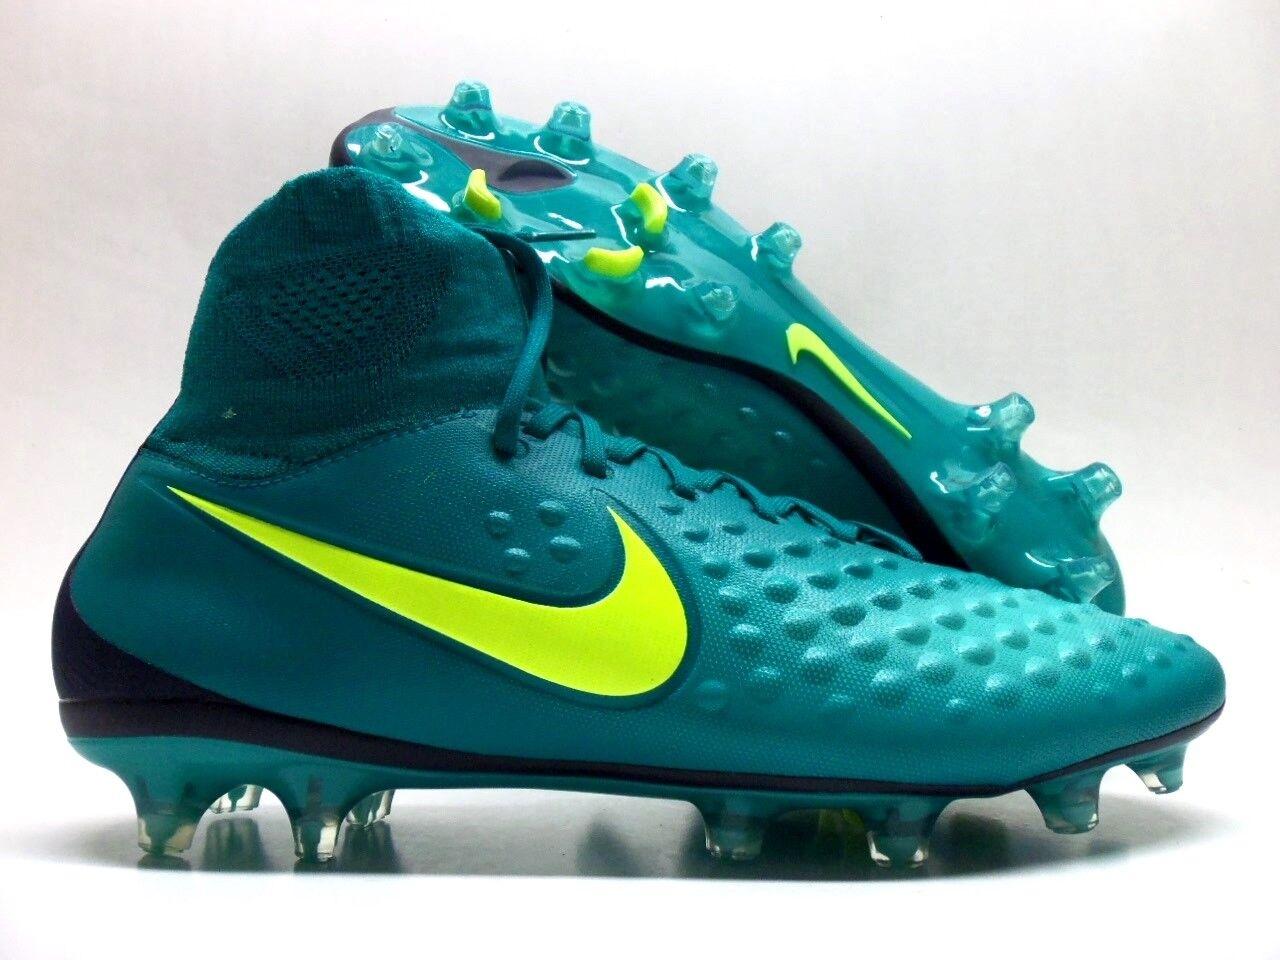 Nike magista orden ii fg schuh rio blaugrün / volt-obsidism größe männer 10,5 [843812-375]